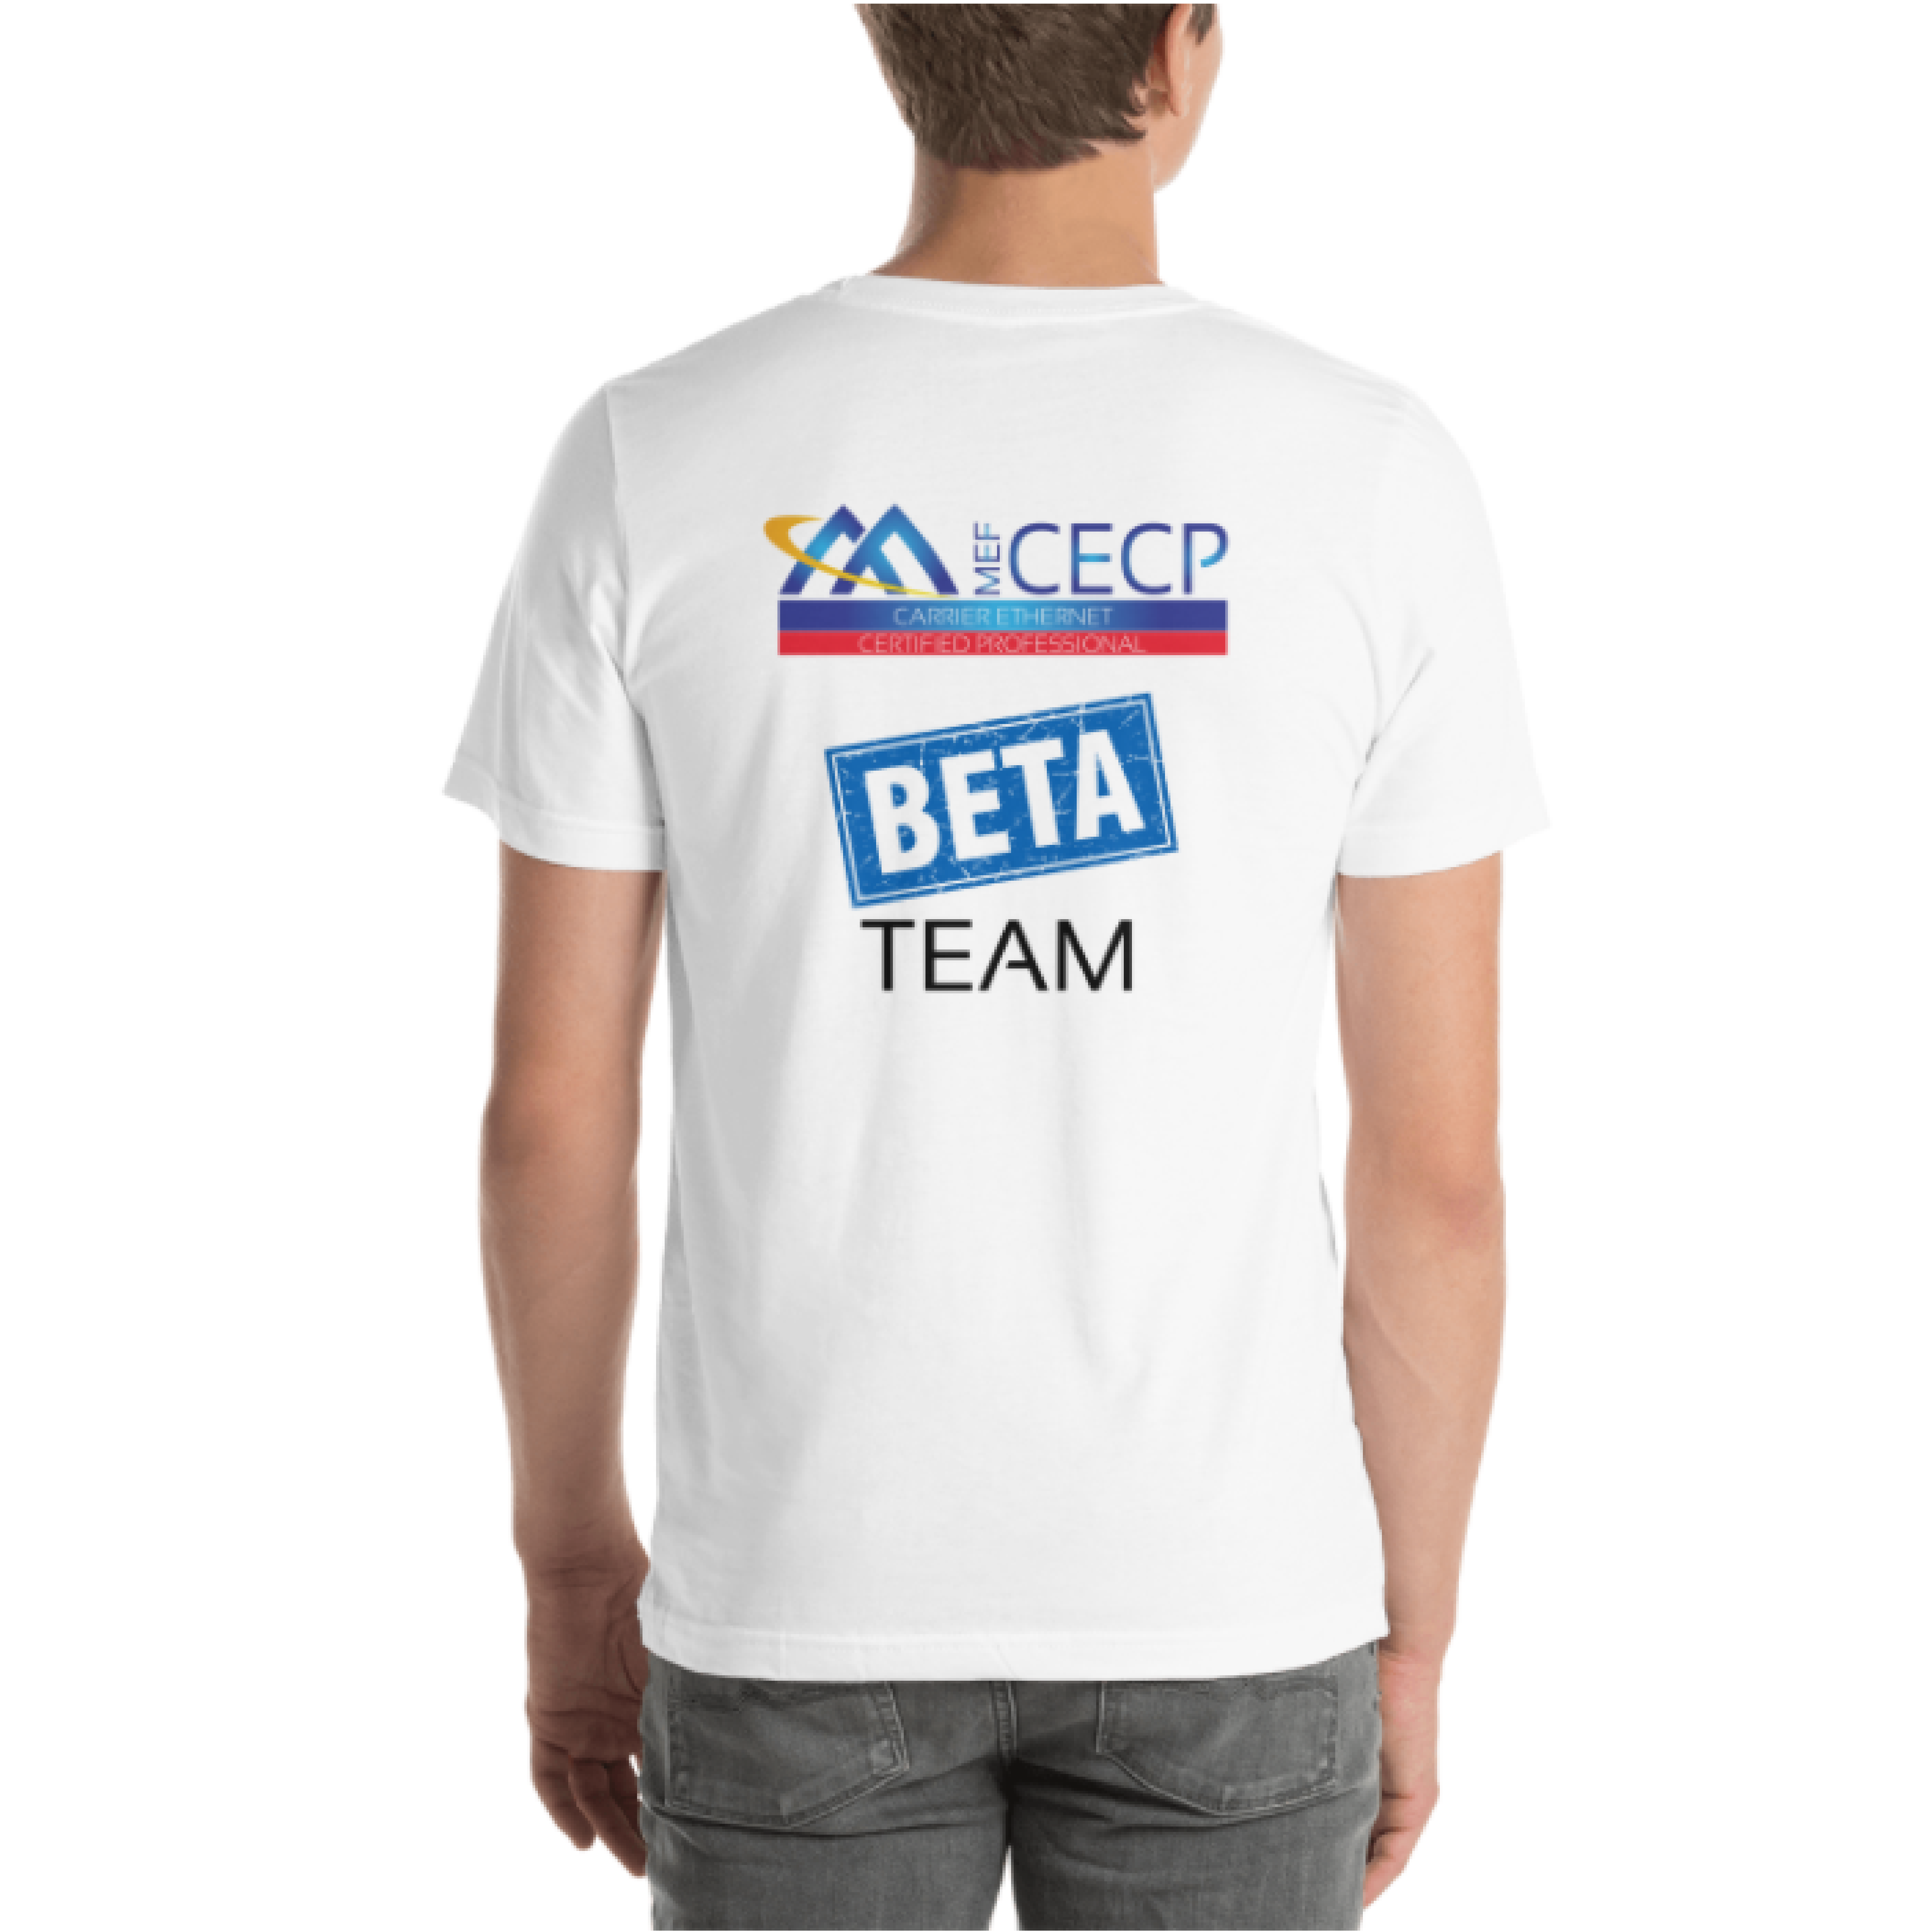 Mef Cecp Beta Team Short Sleeve Unisex T Shirt T Shirts